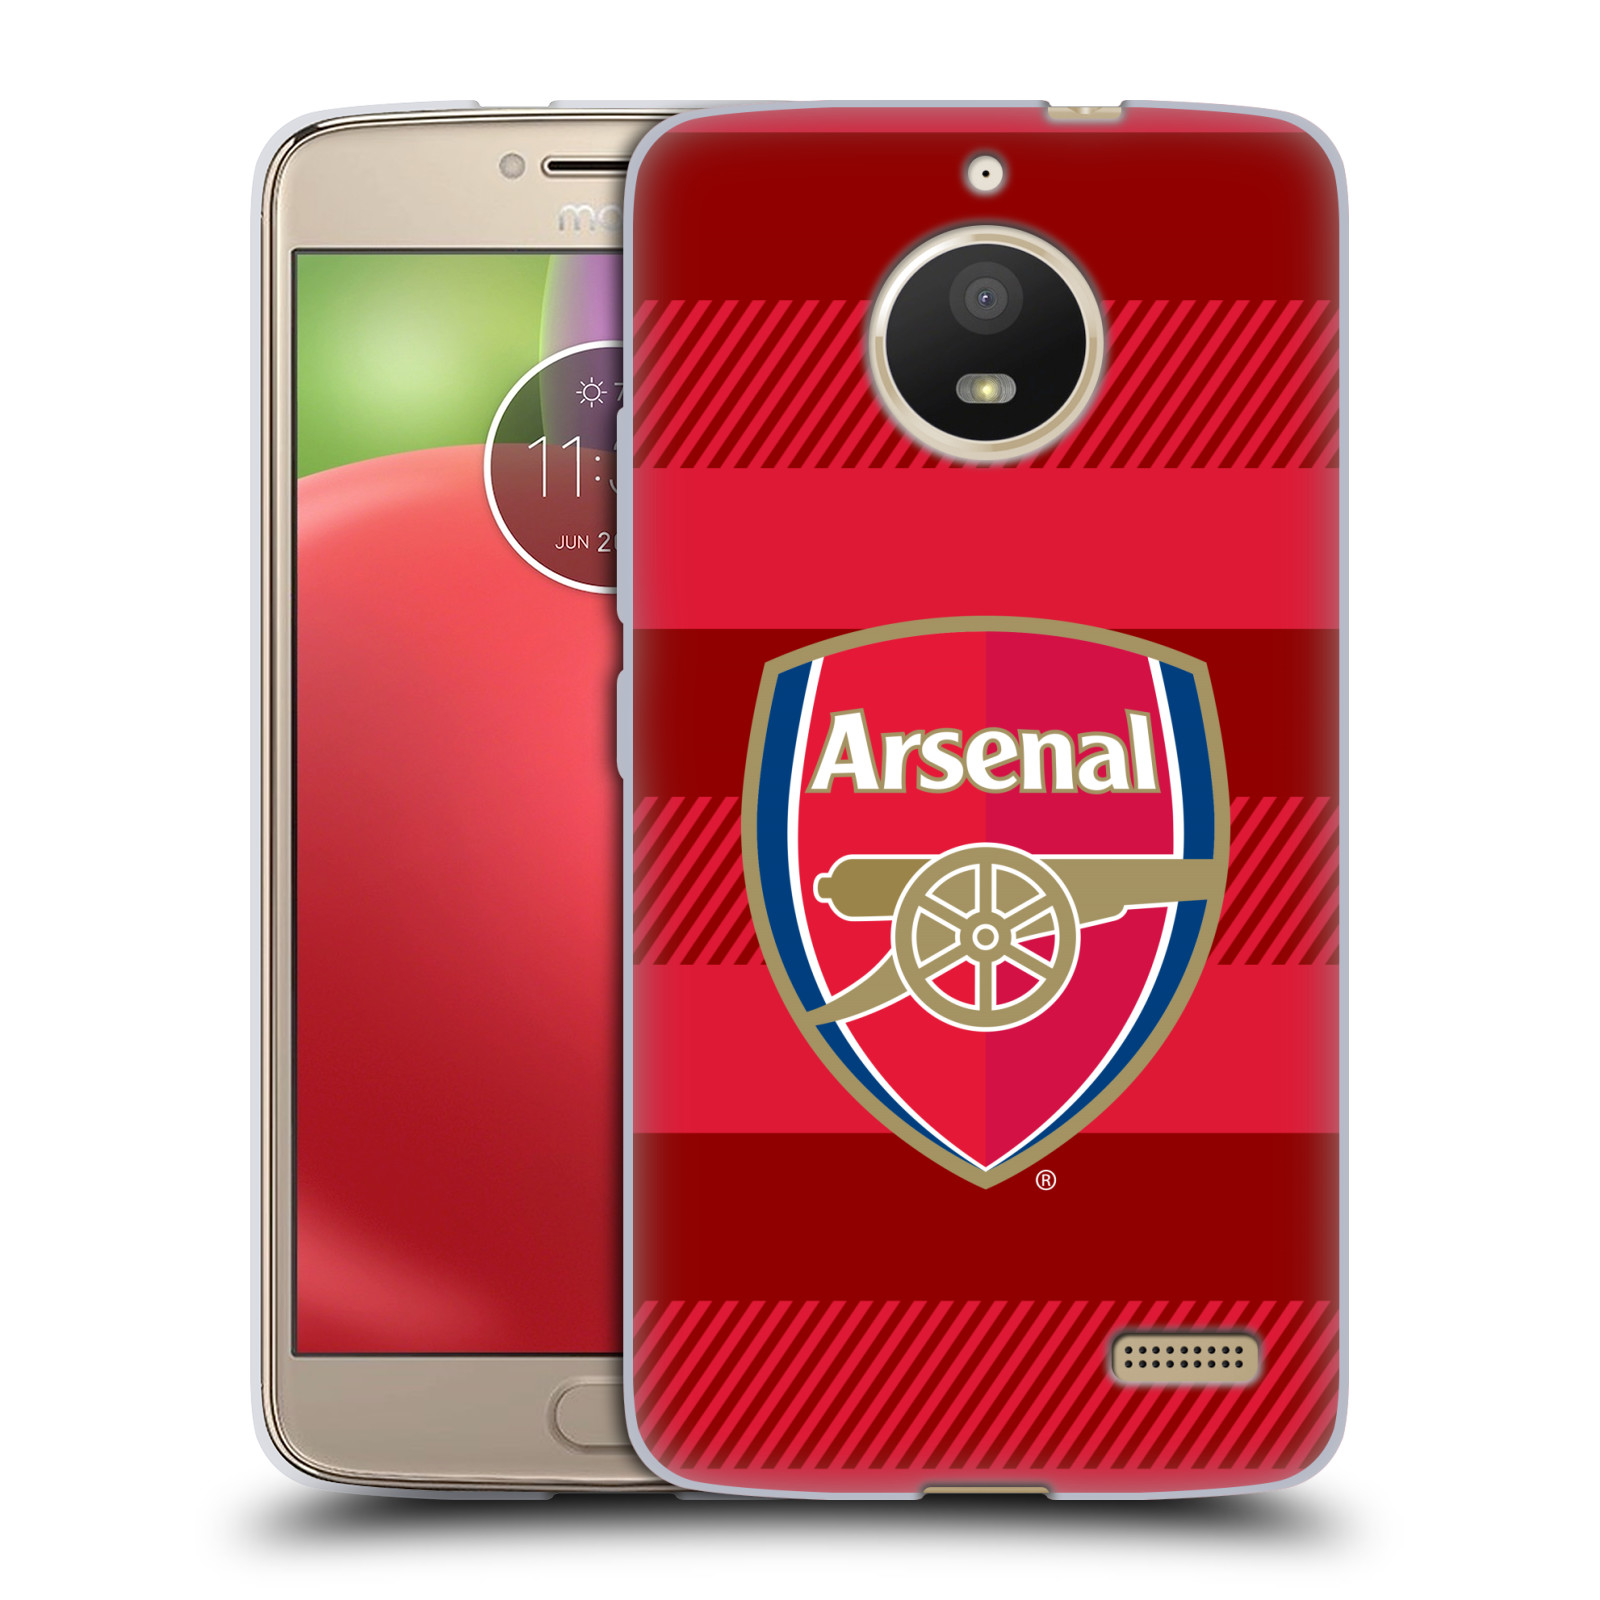 Silikonové pouzdro na mobil Lenovo Moto E4 - Head Case - Arsenal FC - Logo s pruhy